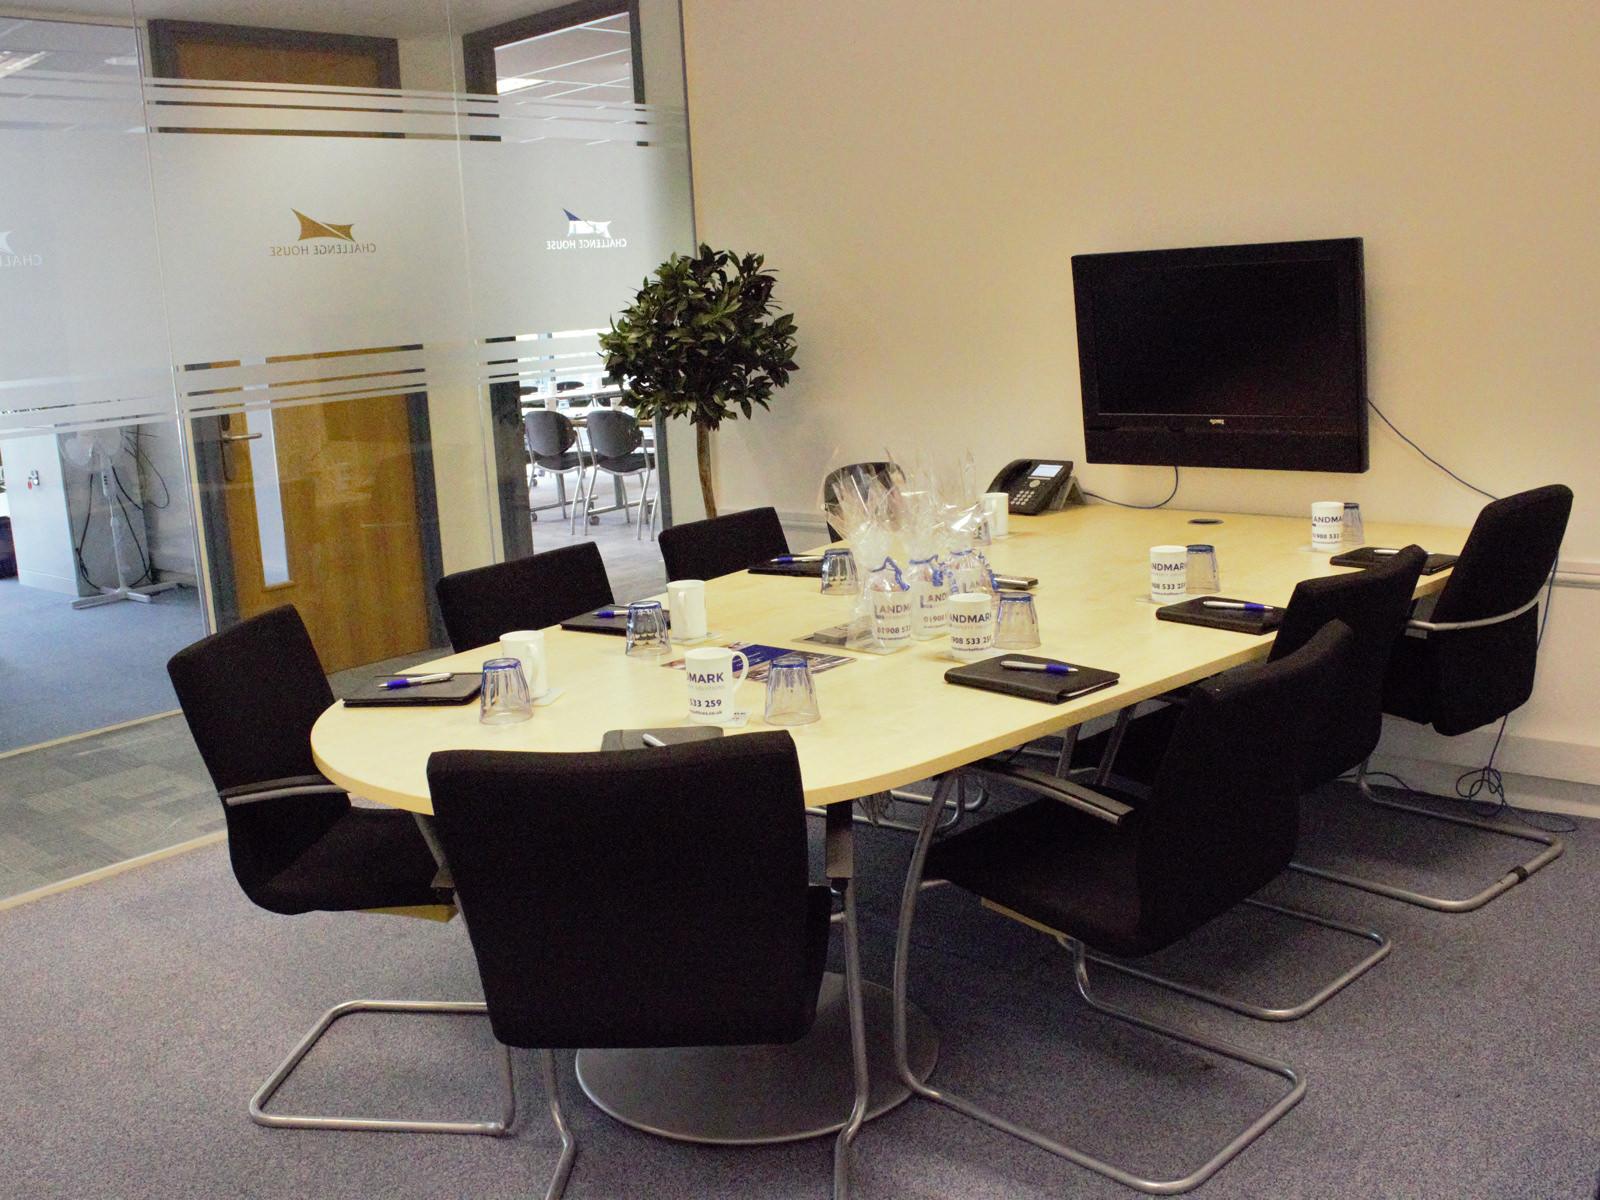 Turing Room (seats 8) - £20/hr